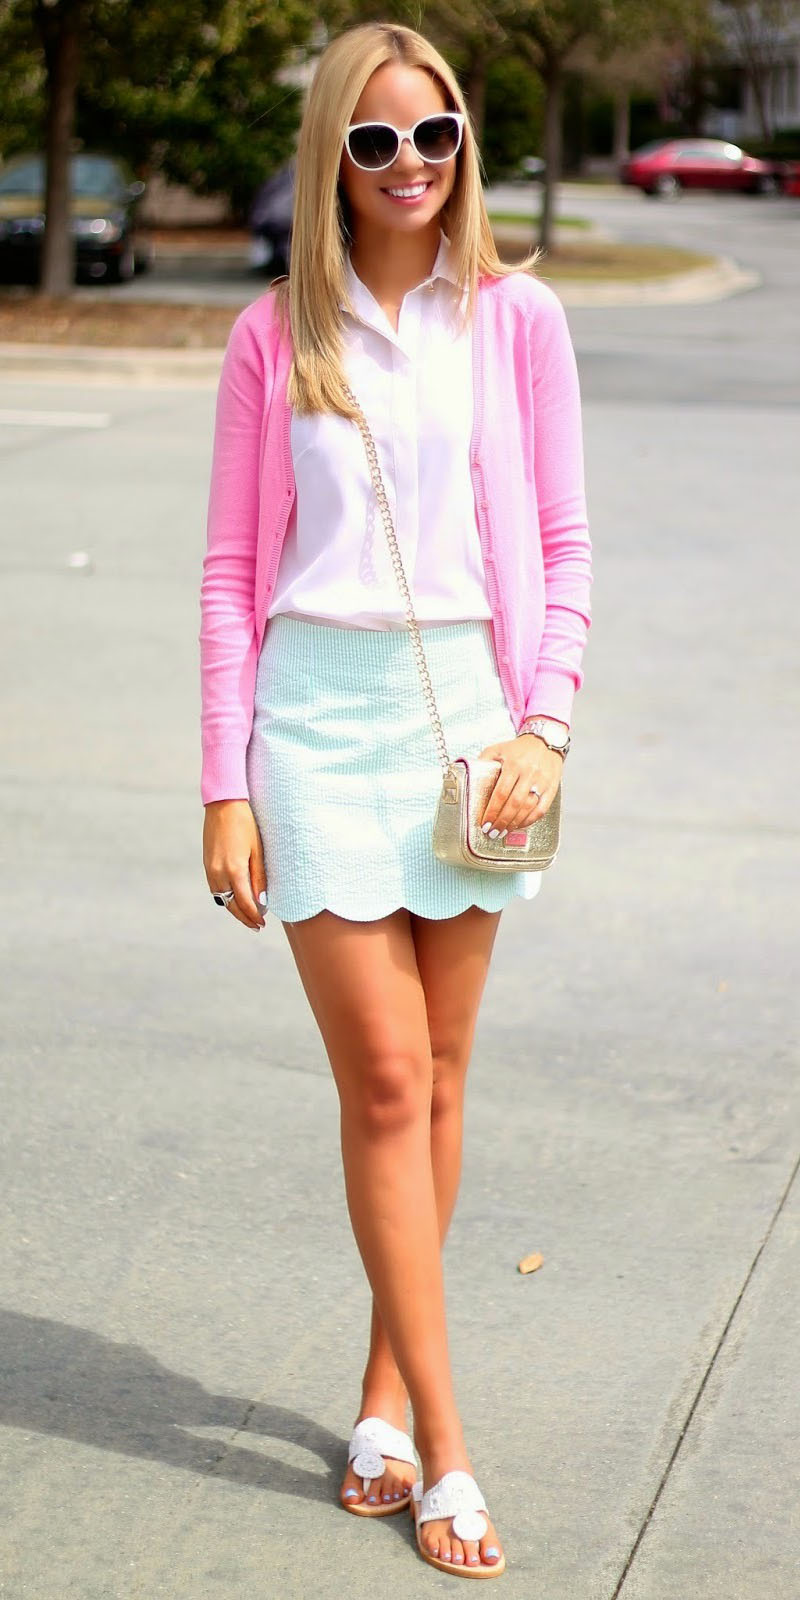 green-light-mini-skirt-pink-light-collared-shirt-pink-light-cardigan-white-shoe-sandals-tan-bag-sun-blonde-spring-summer-lunch.jpg